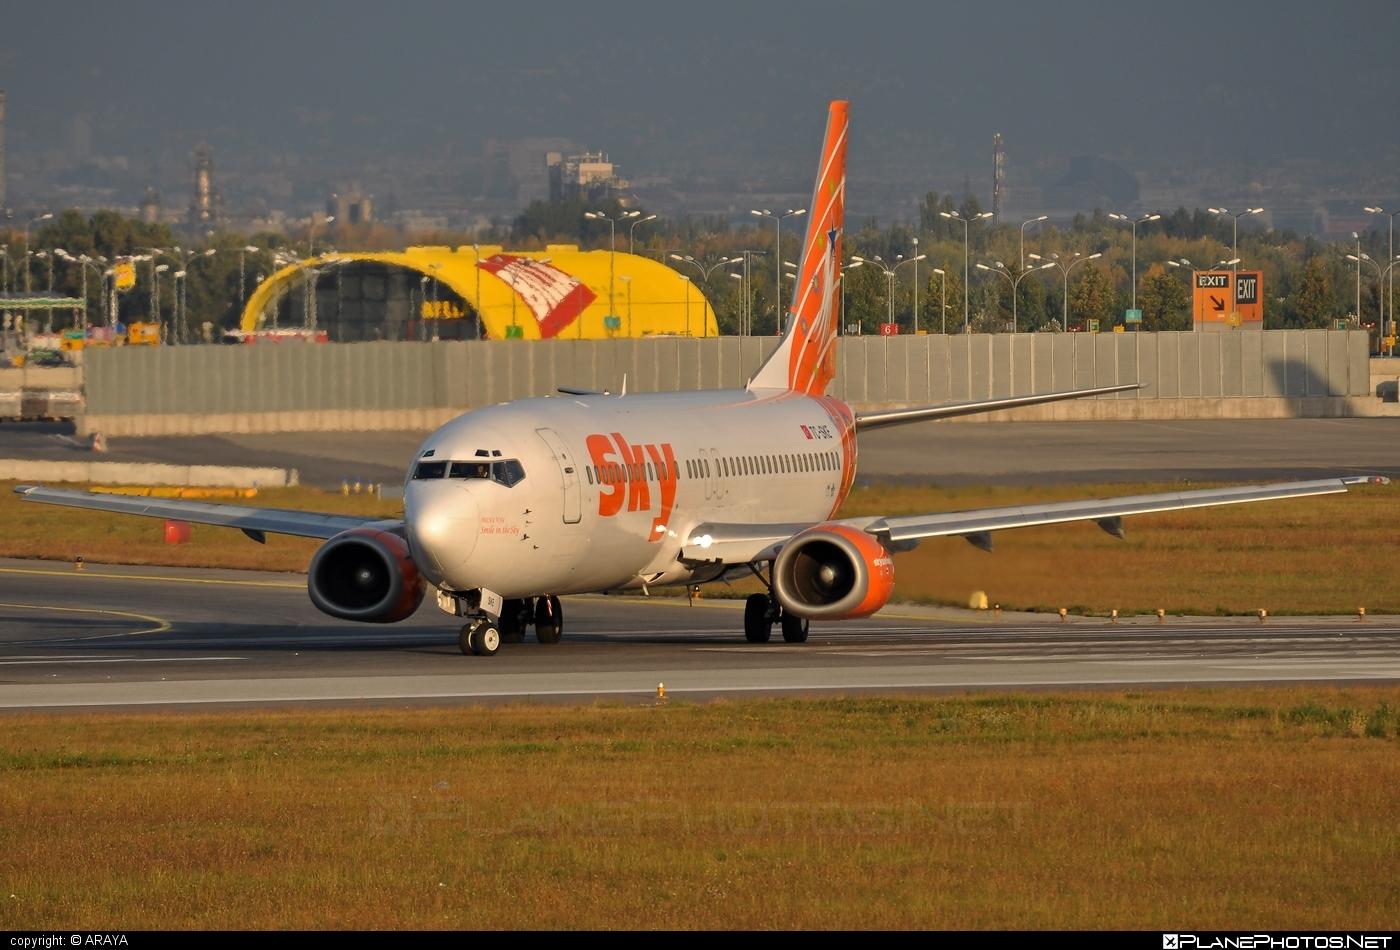 Boeing 737-400 - TC-SKE operated by Sky Airlines #b737 #boeing #boeing737